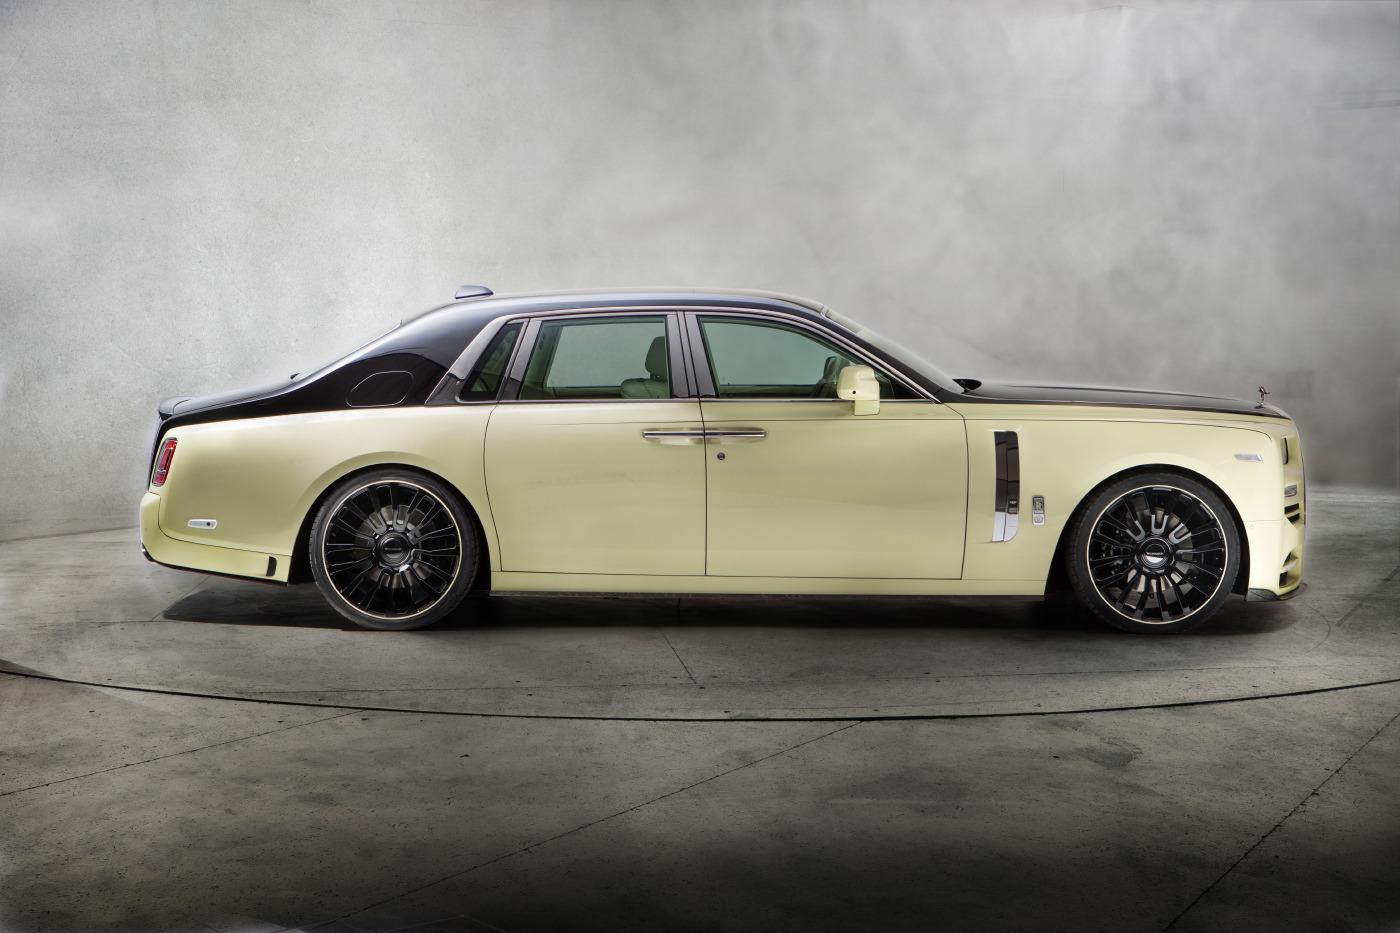 Best Sound System In Luxury Cars